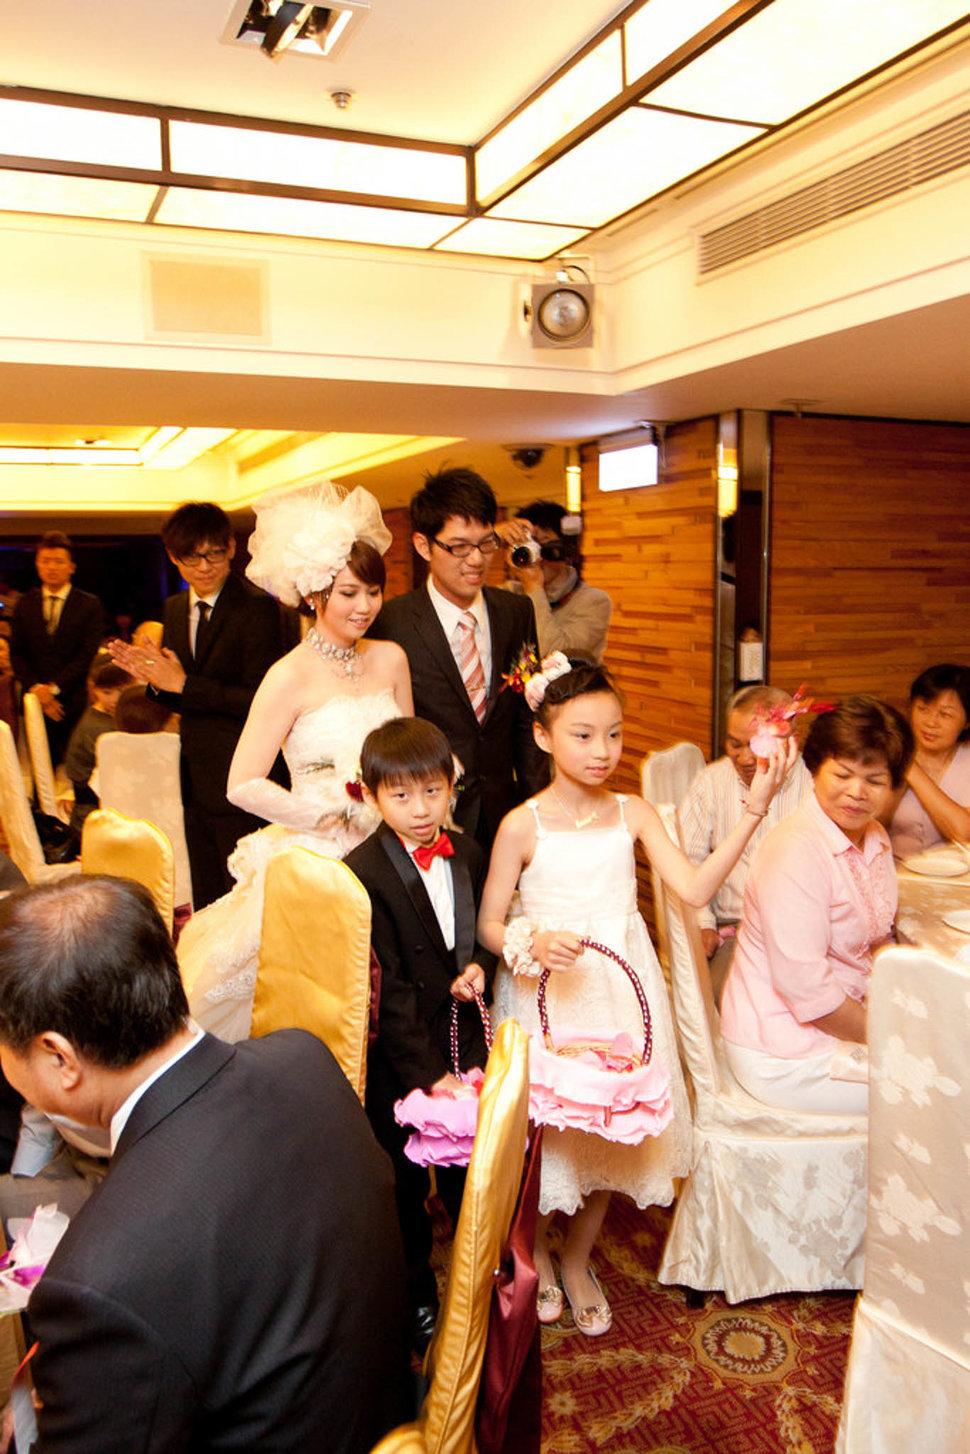 18PHOTO-佳成❤️ 玨萍(編號:220188) - 18PHOTO 婚紗影像攝影工作室 - 結婚吧